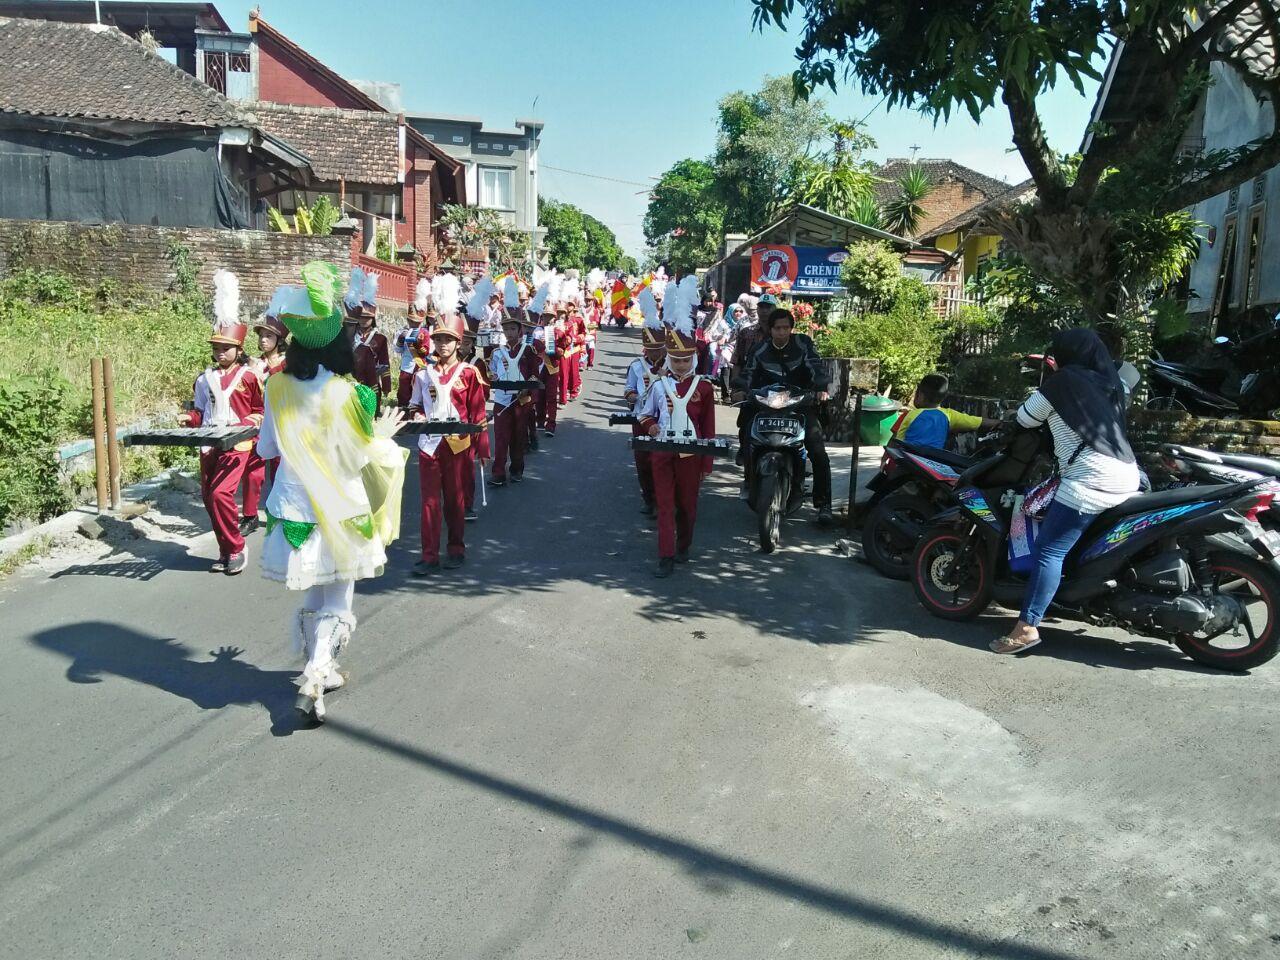 Anggota Polsek Junrejo Polres Batu Pam Pawai Ta`aruf Dalam Rangka Menyambut Romadhon